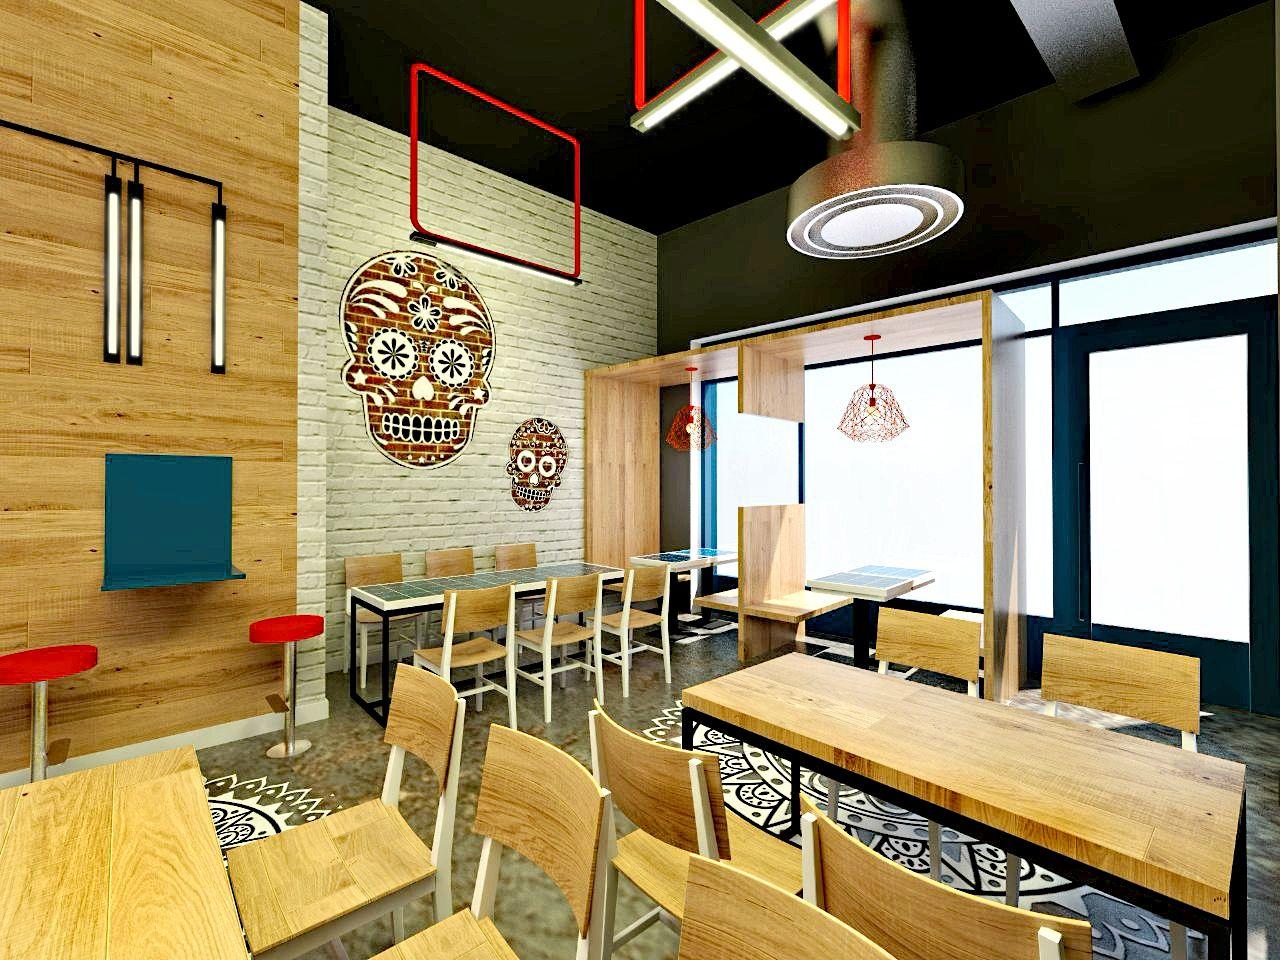 Restaurant Design - Render - Jean Prouve Chair - Bespoke Furniture ...